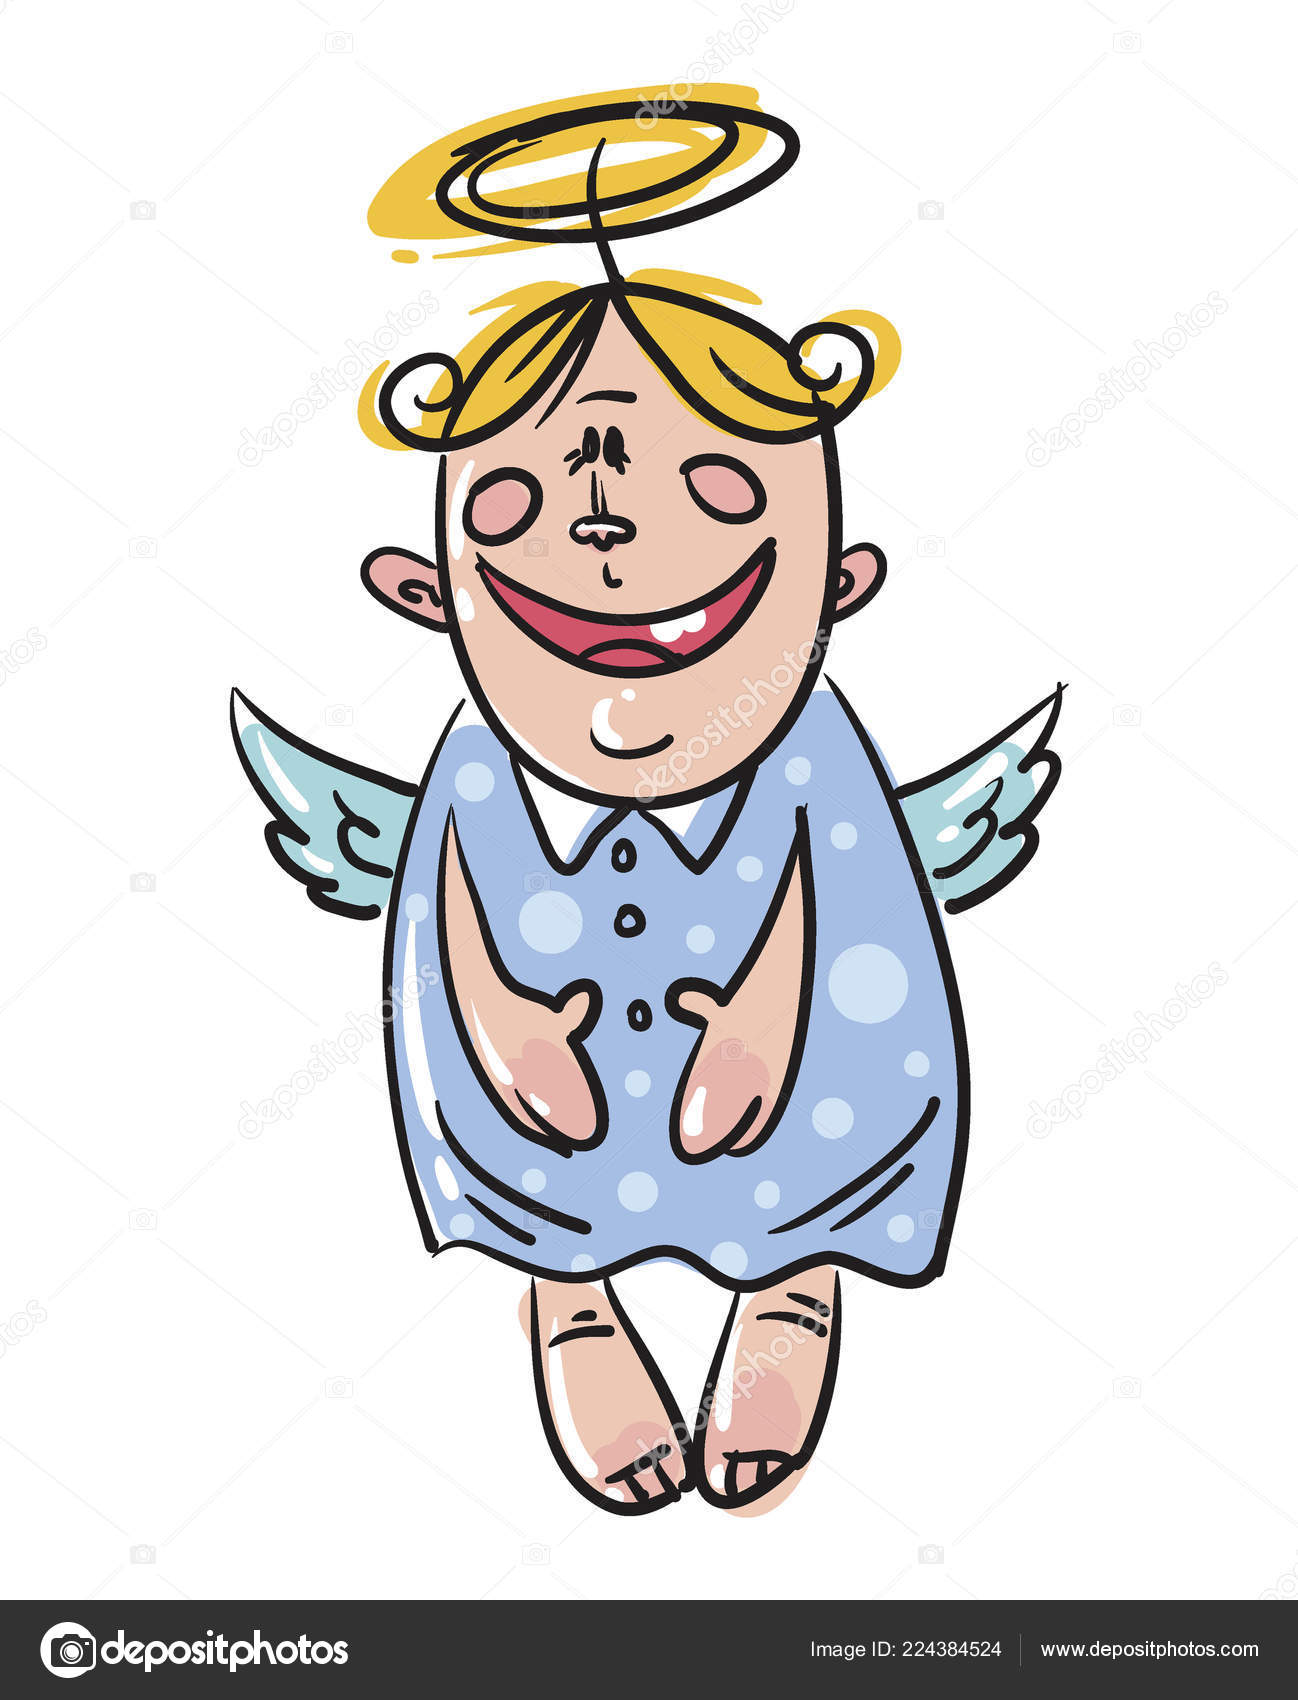 Funny Angel : funny, angel, Funny, Christmas, Angel, Vector, Illustration, Image, YurikswO, Stock, 224384524